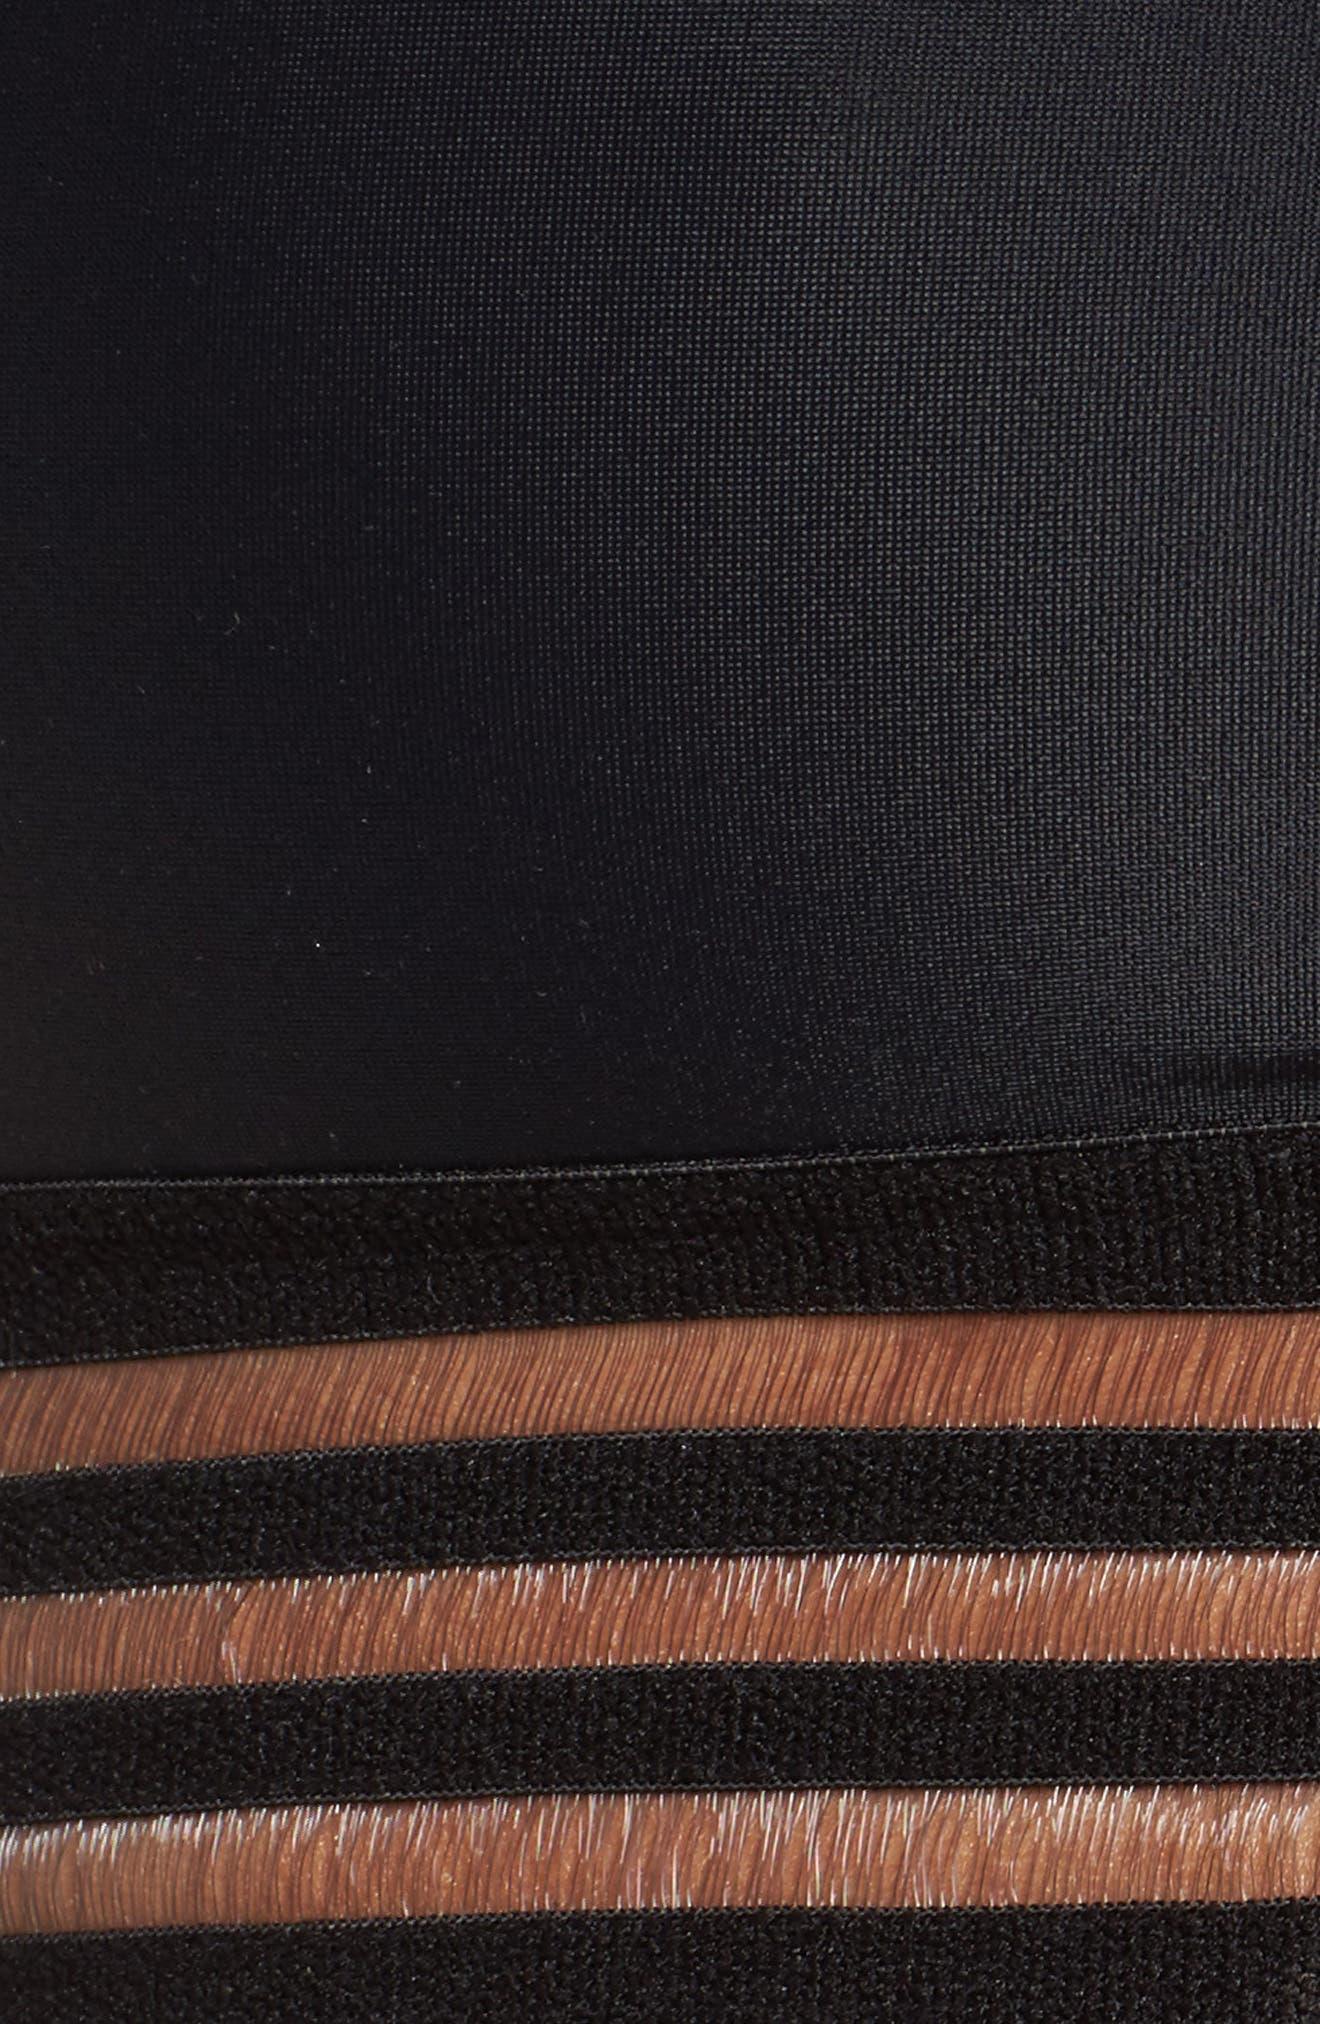 Ritz Sports Bra,                             Alternate thumbnail 9, color,                             Black